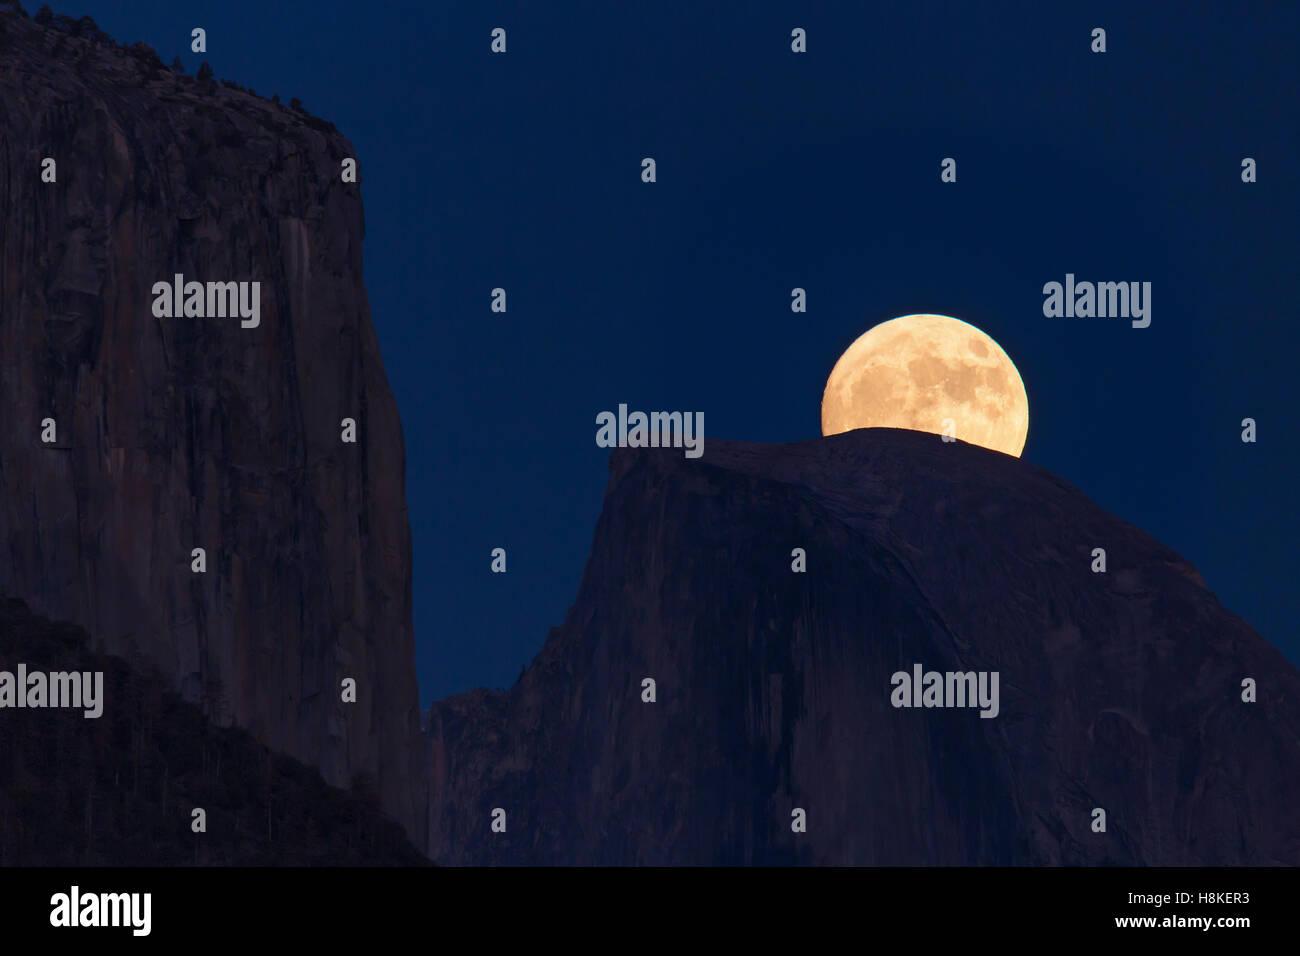 Yosemite National Park, USA. 13th Nov, 2016. Super Moon Rising Over Half Dome in Yosemite National Park, USA. Credit: Stock Photo